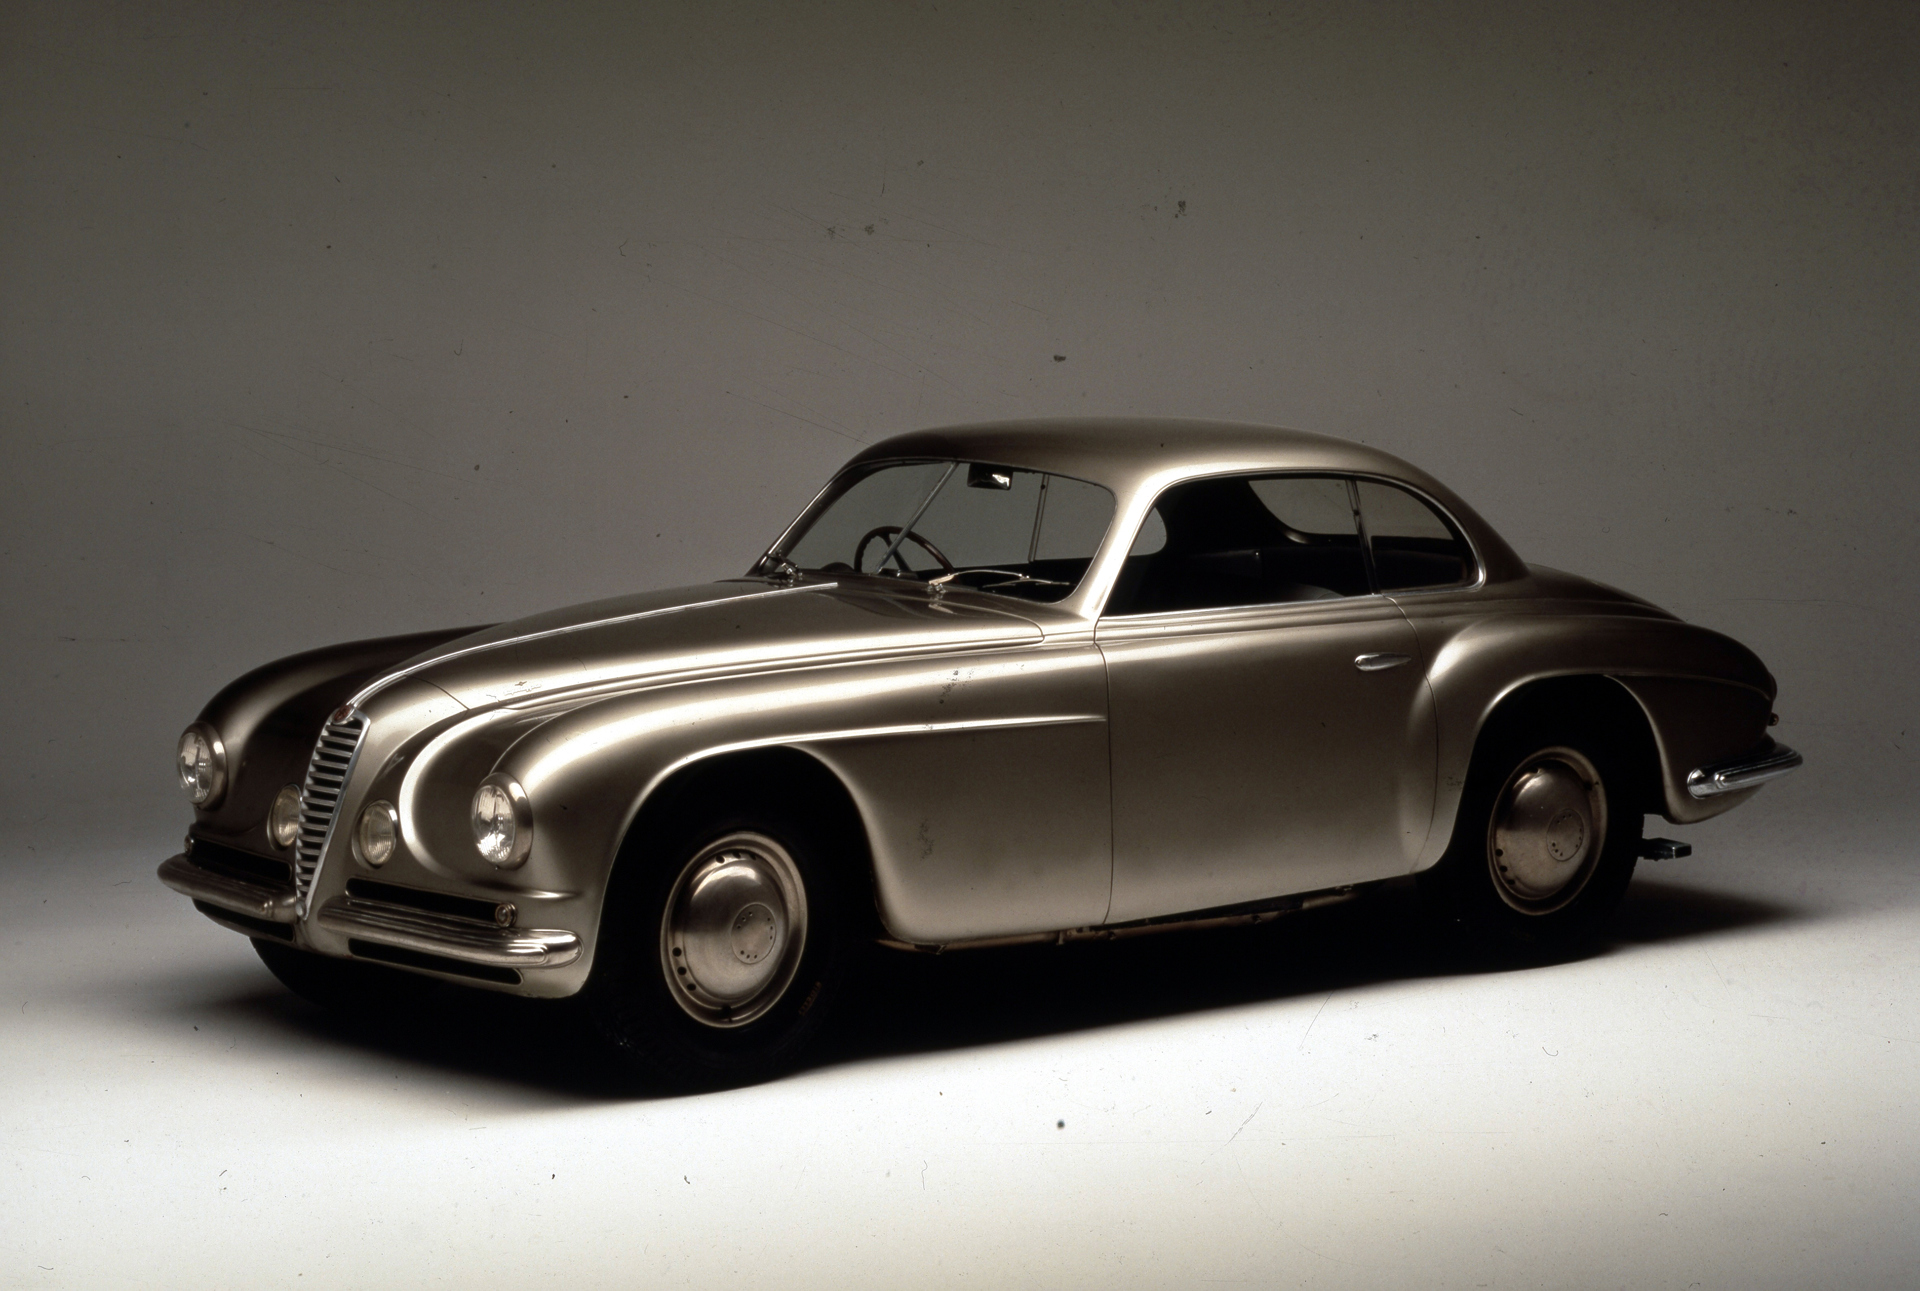 1950 6C 2500 Villa d'Este Coupe.jpg.jpg